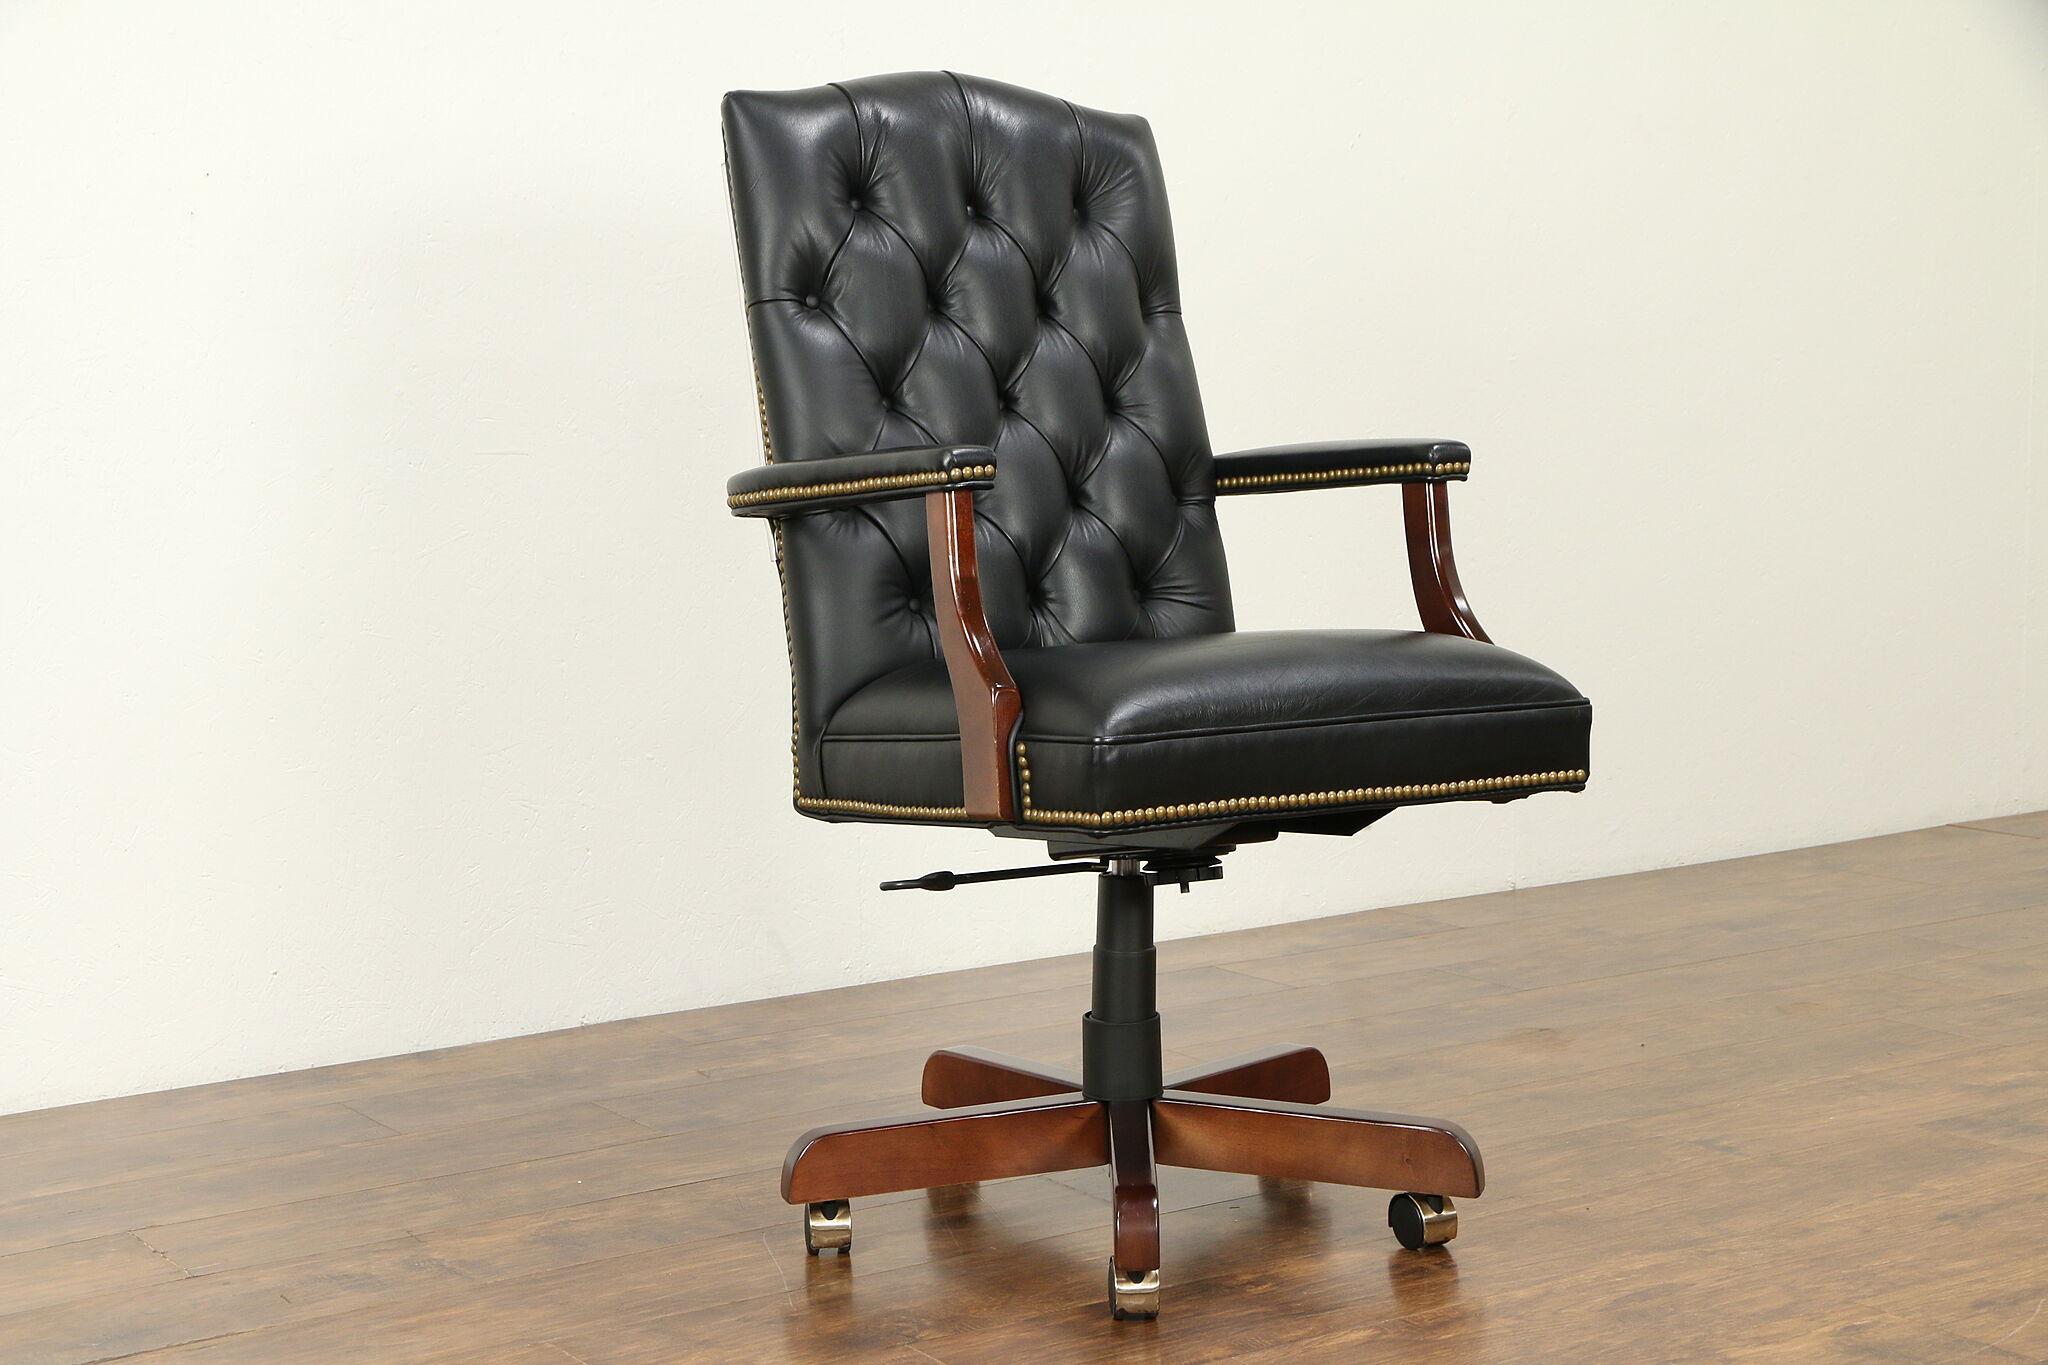 Fine Tufted Leather Vintage Swivel Adjustable Desk Chair Jasper 31759 Spiritservingveterans Wood Chair Design Ideas Spiritservingveteransorg